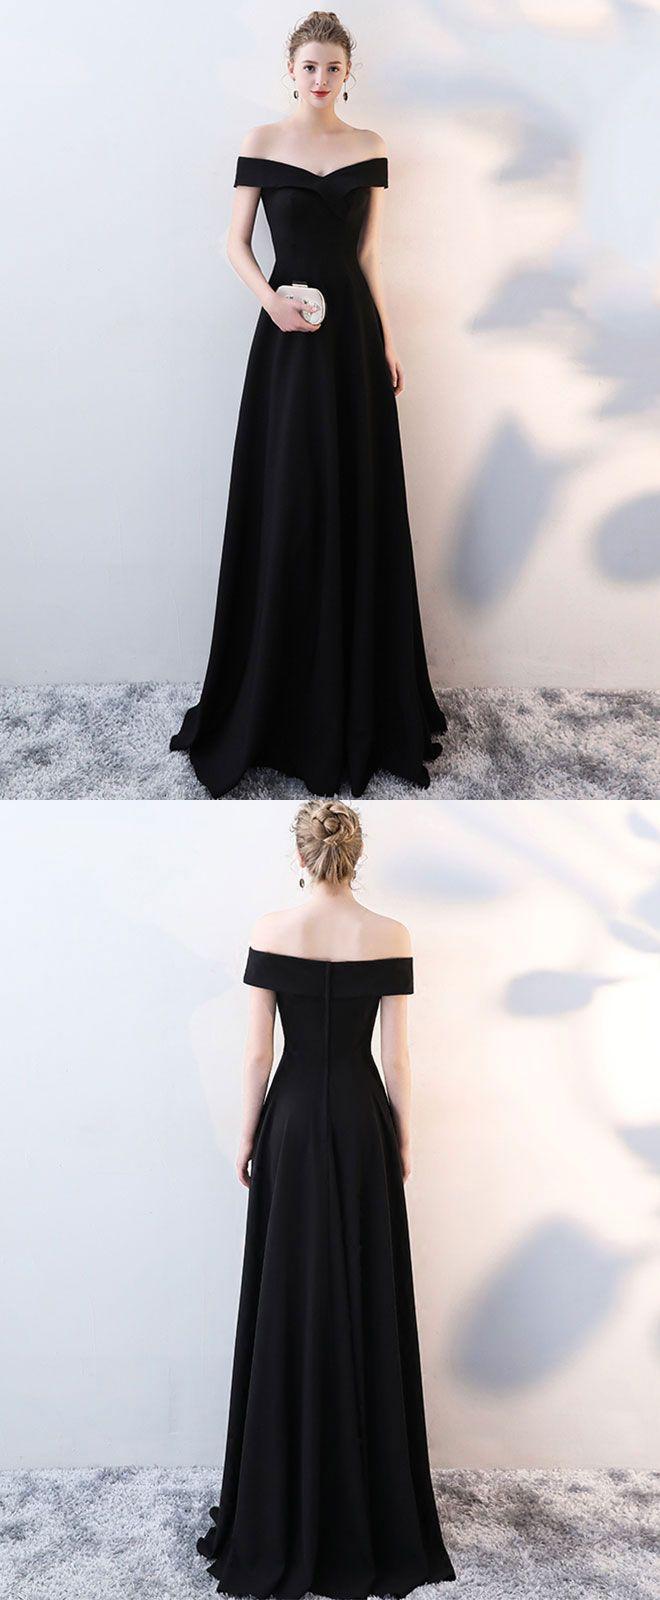 Simple black v neck long prom dress black evening dress in